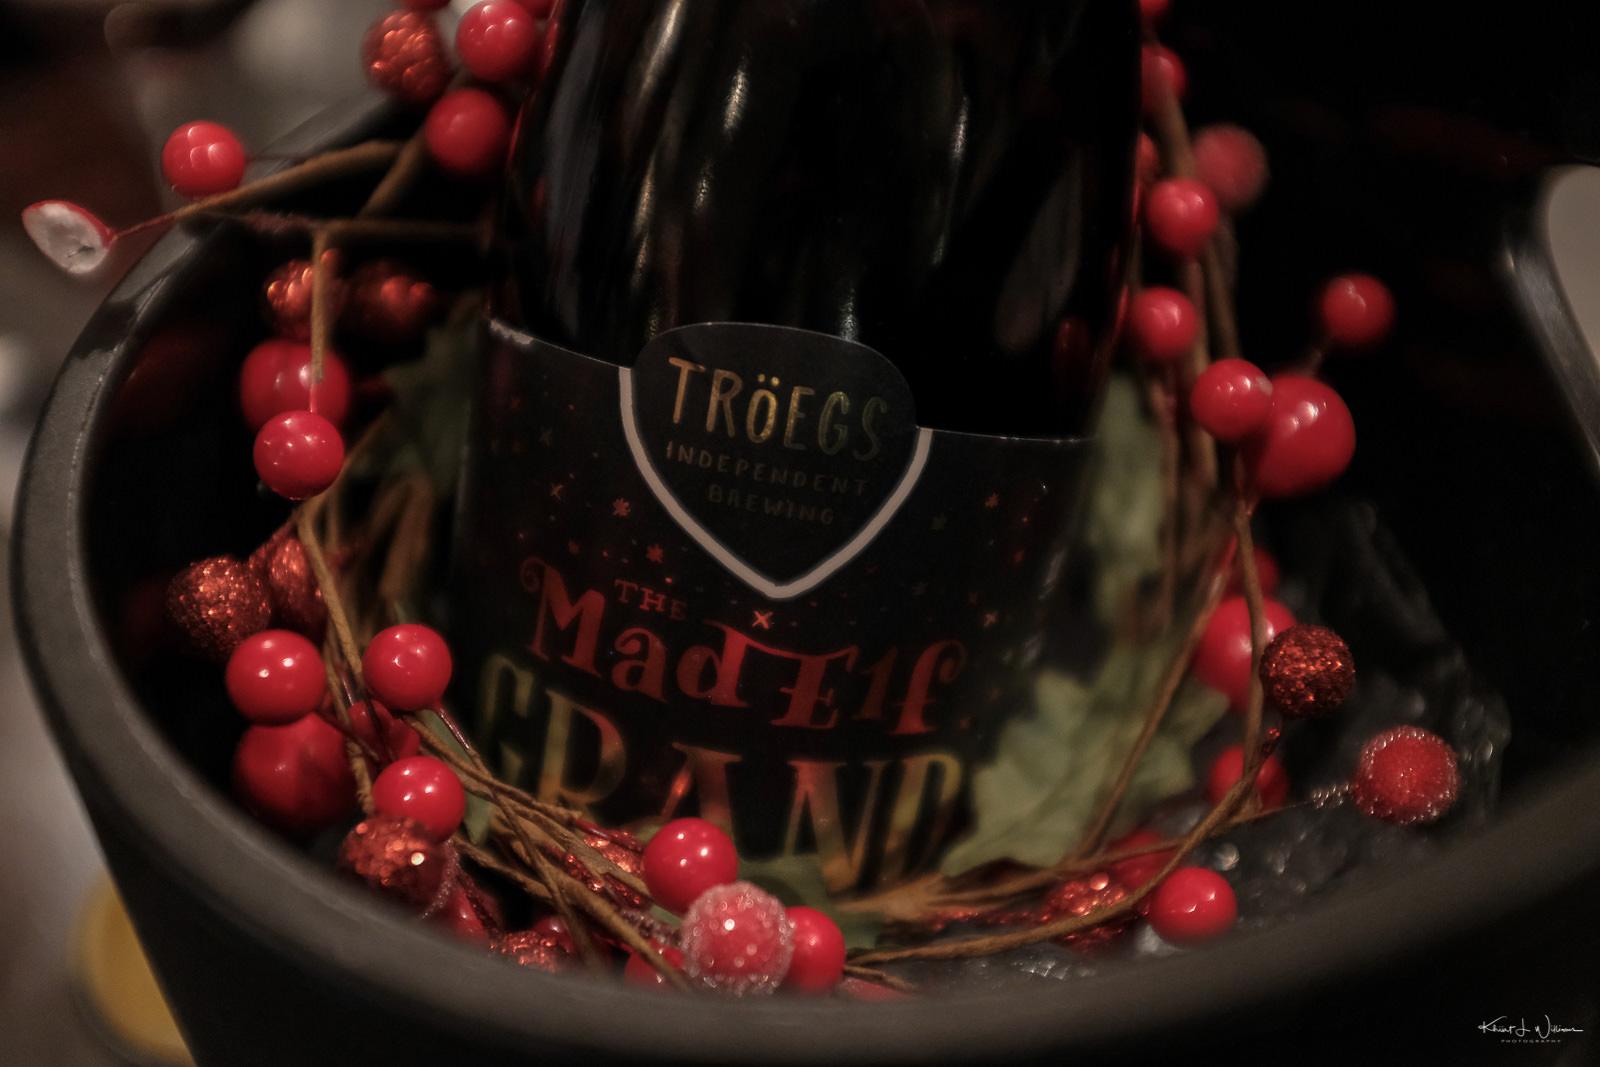 Troegs Independent Brewing Mad Elf Grand Cru